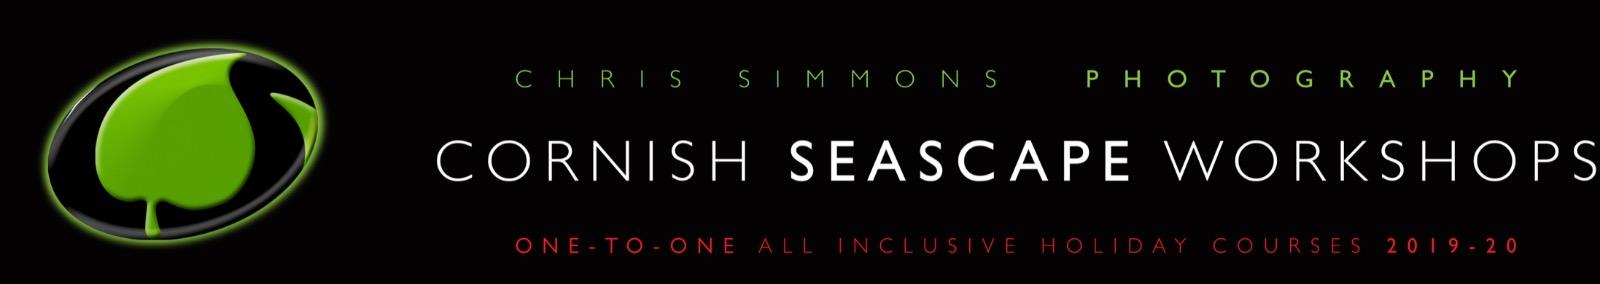 Chris Simmons Seascape Workshops